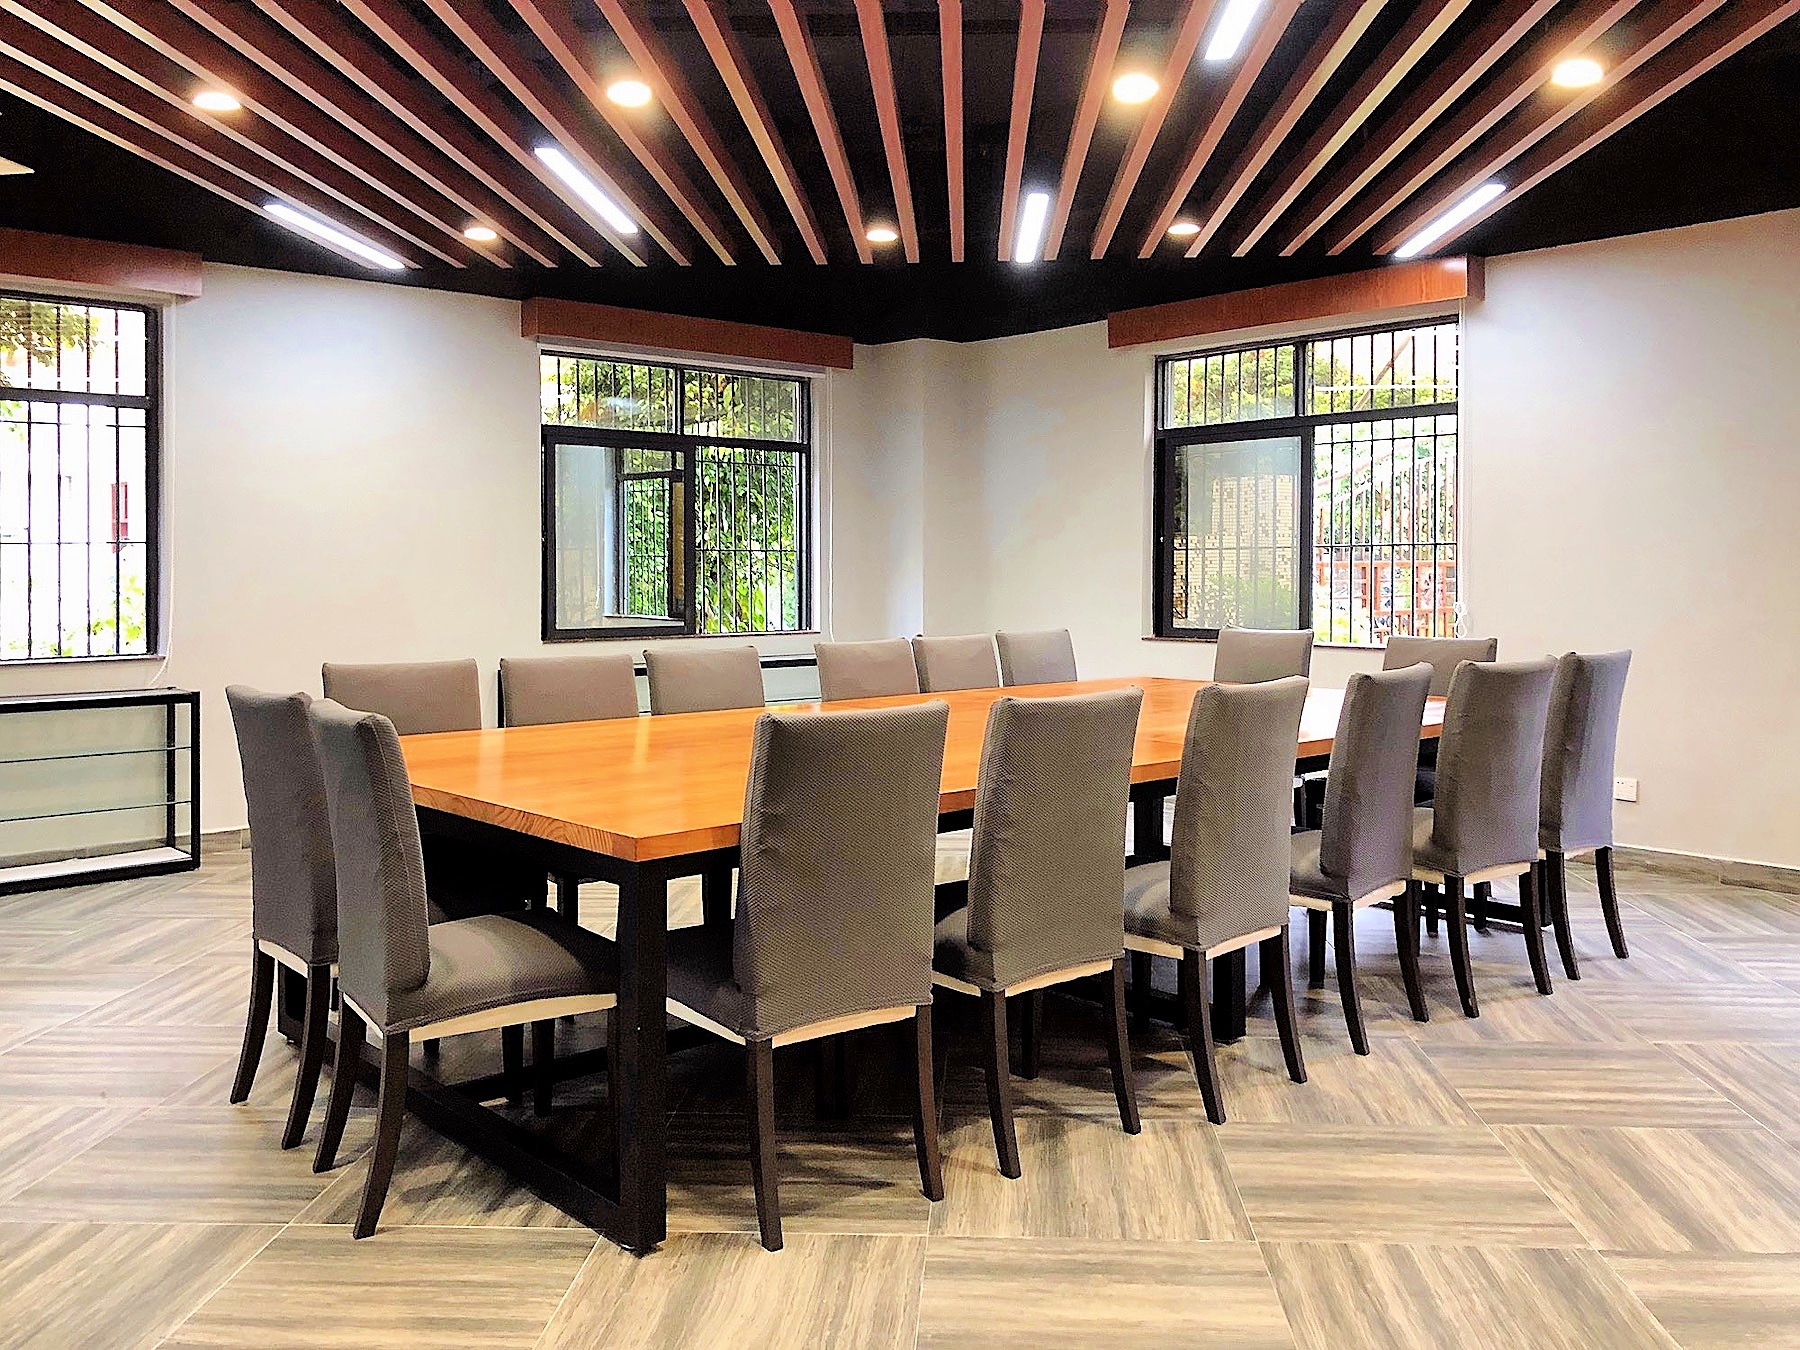 Grandway Office Renovation 2018 Multi Function Room 01 003